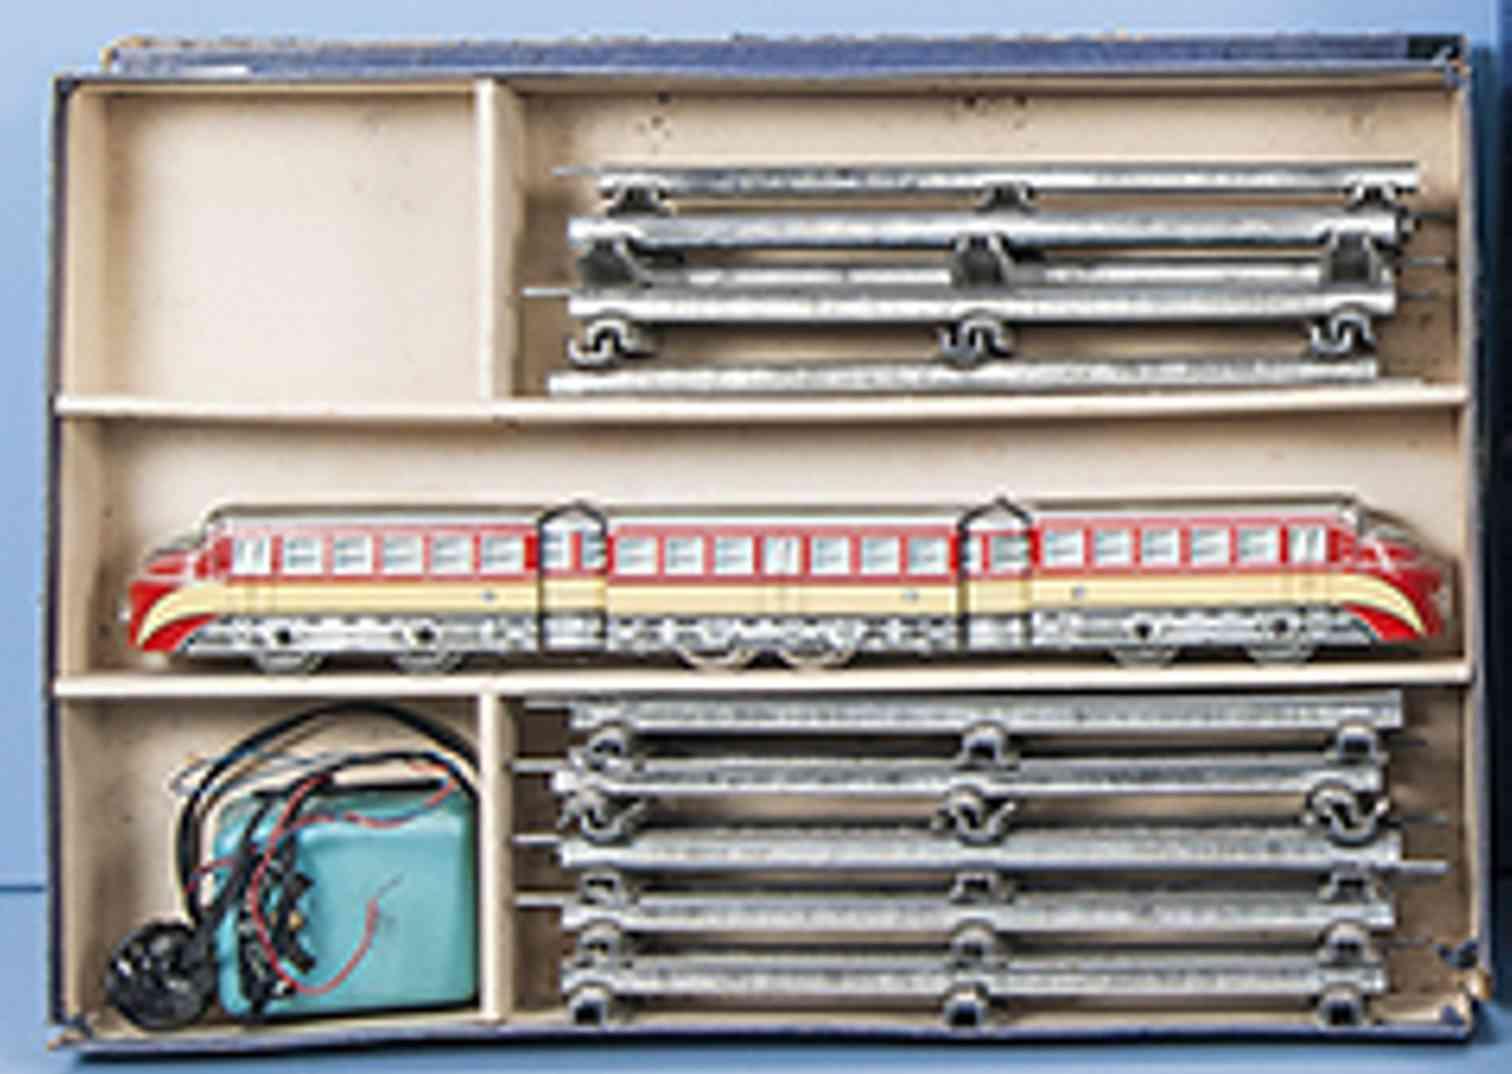 distler johann railway toy starter set diesel multiple unit 3-part railcar gauge 0